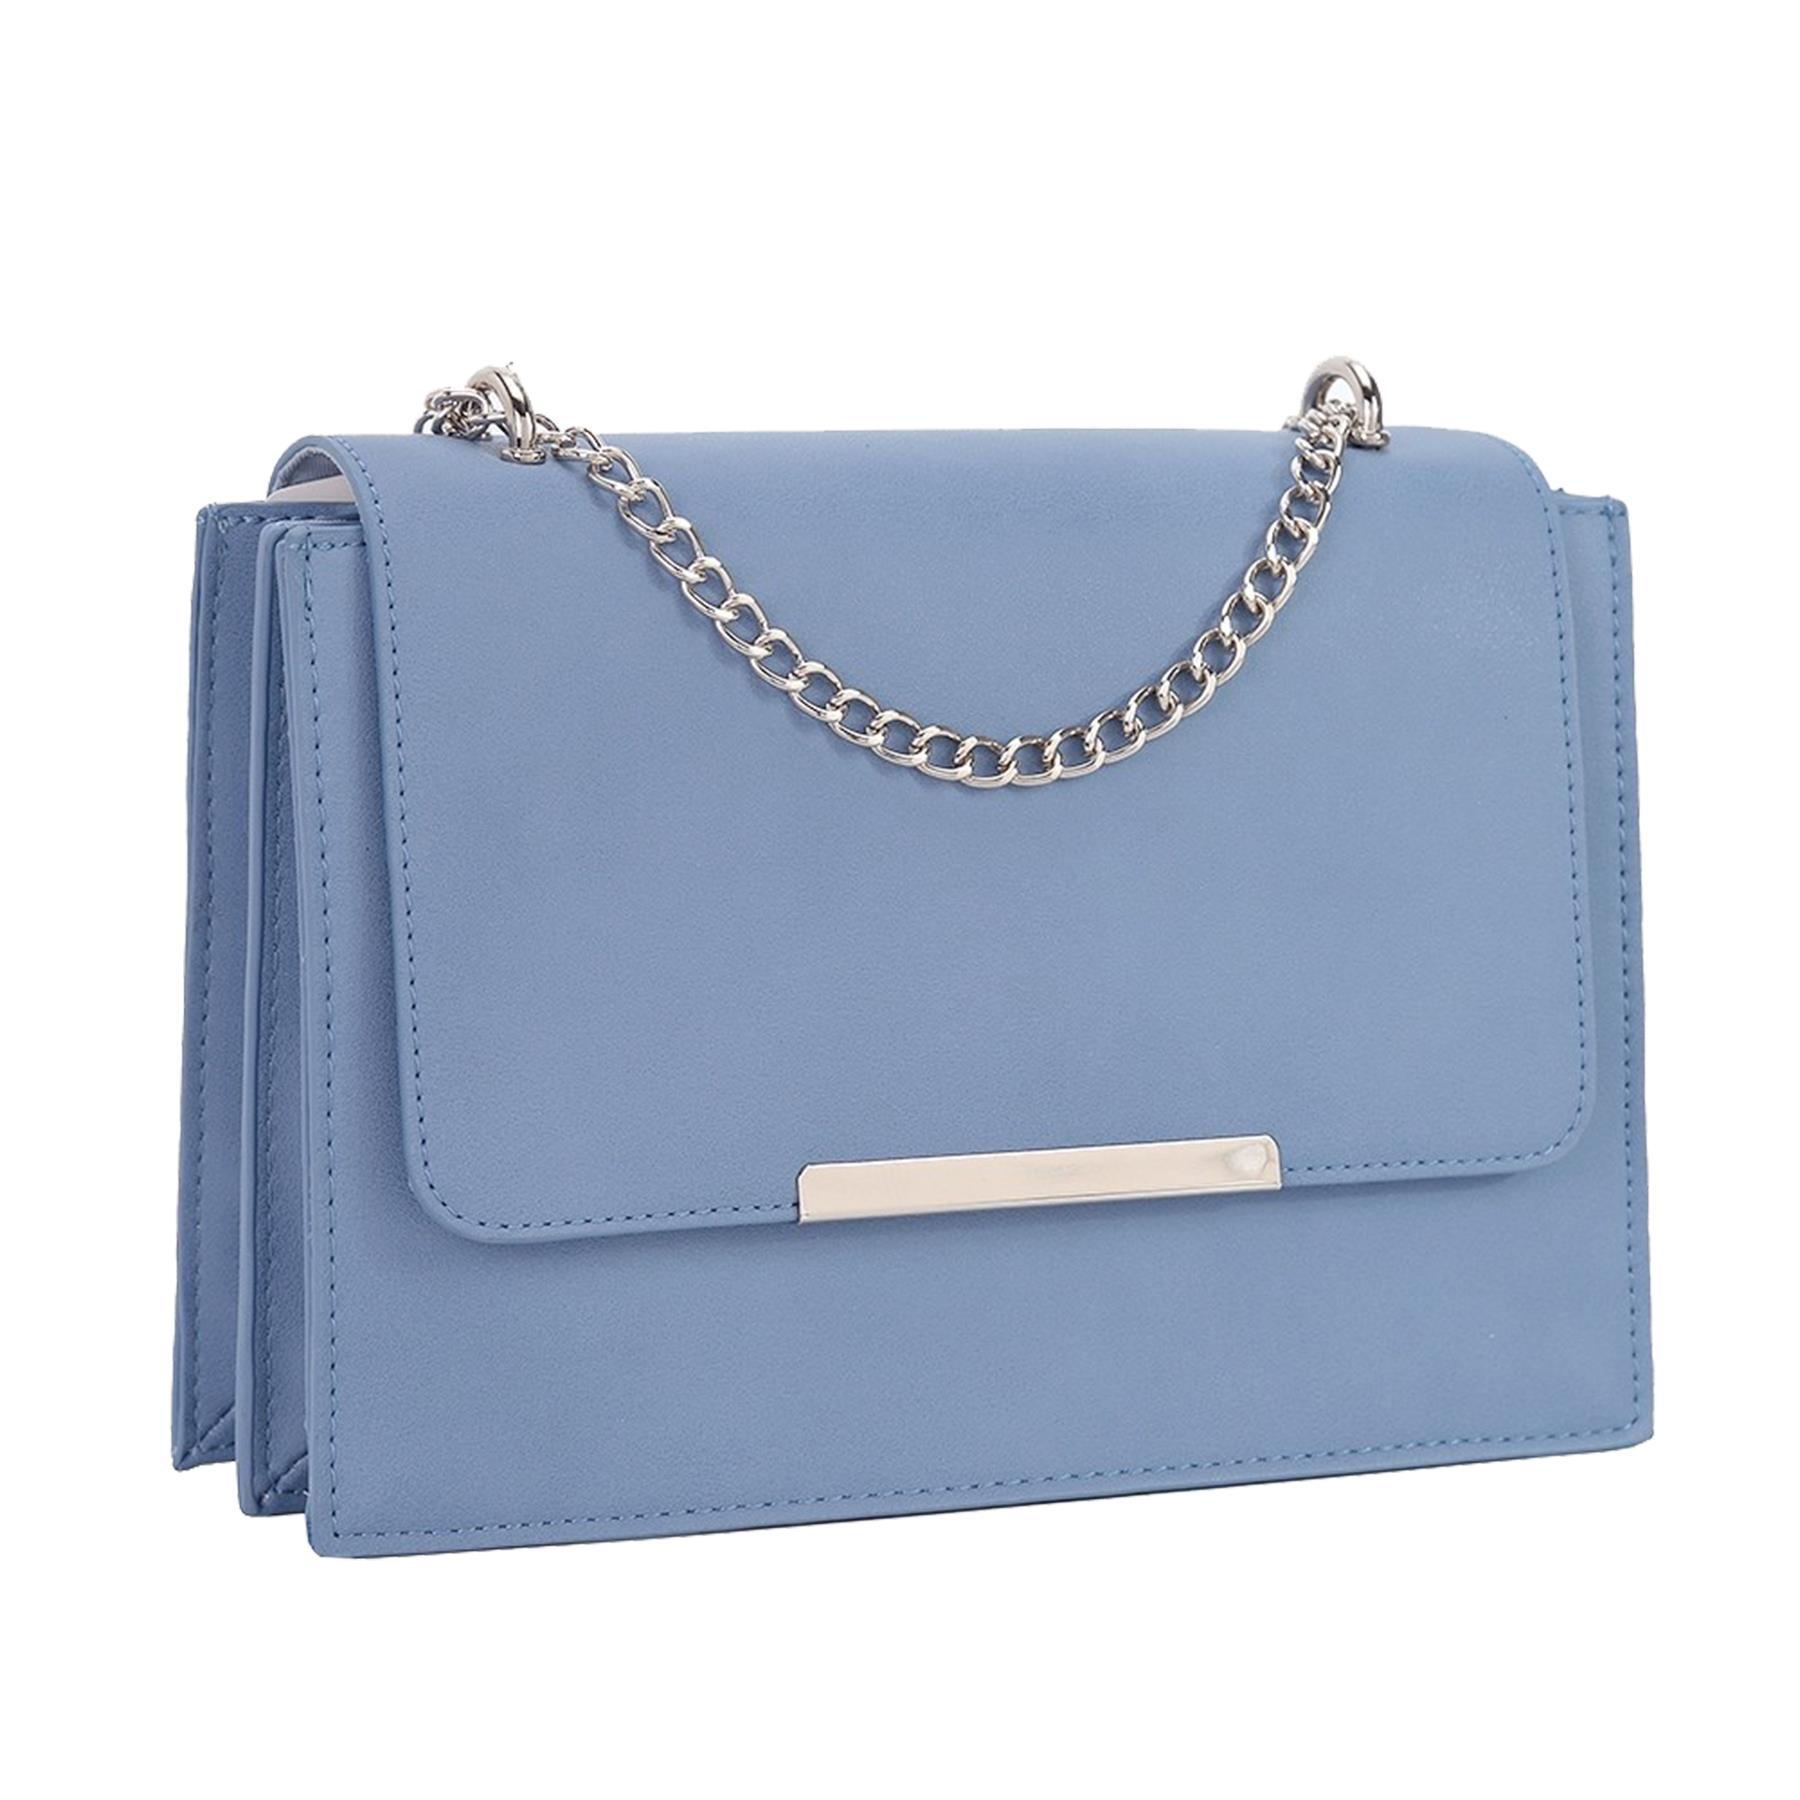 New-Women-s-Faux-Leather-Elegant-Stylish-Fashion-Shoulder-Clutch-Bag thumbnail 6